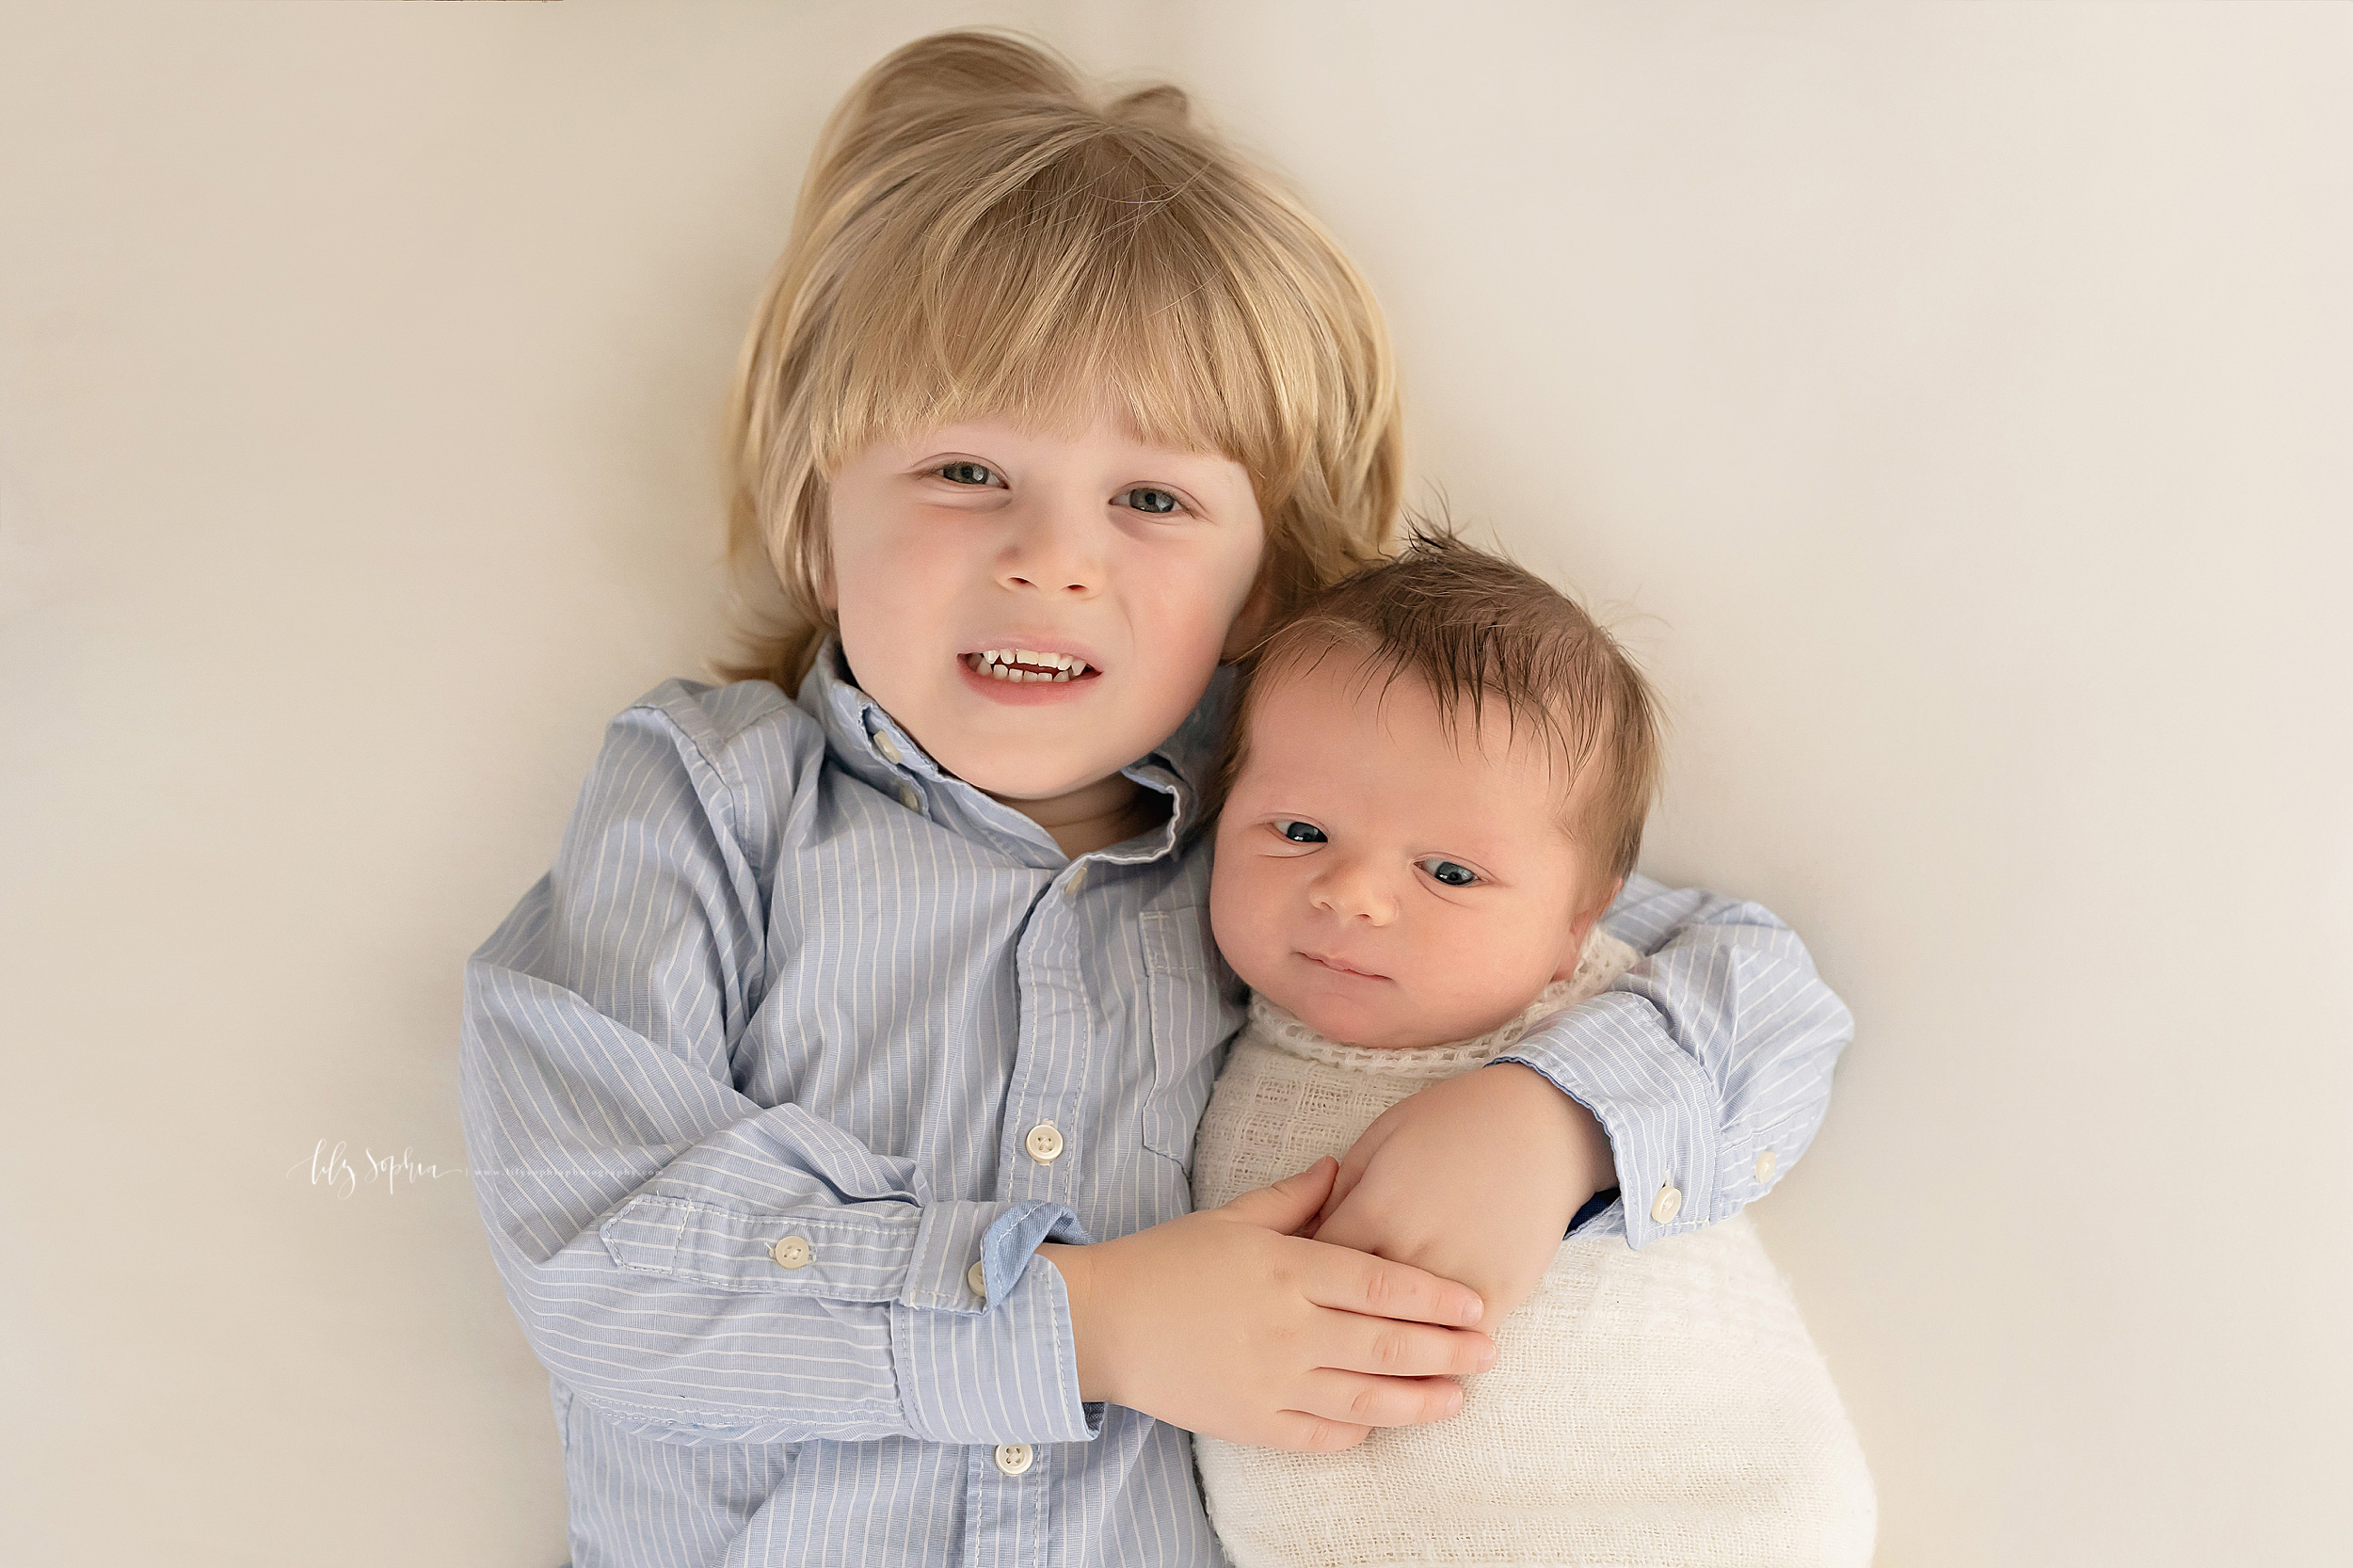 atlanta-midtown-brookhaven-ashford-dunwoody-virginia-highlands-roswell-decatur-lily-sophia-photography-newborn-baby-boy-big-brother-family-studio-session_0613.jpg